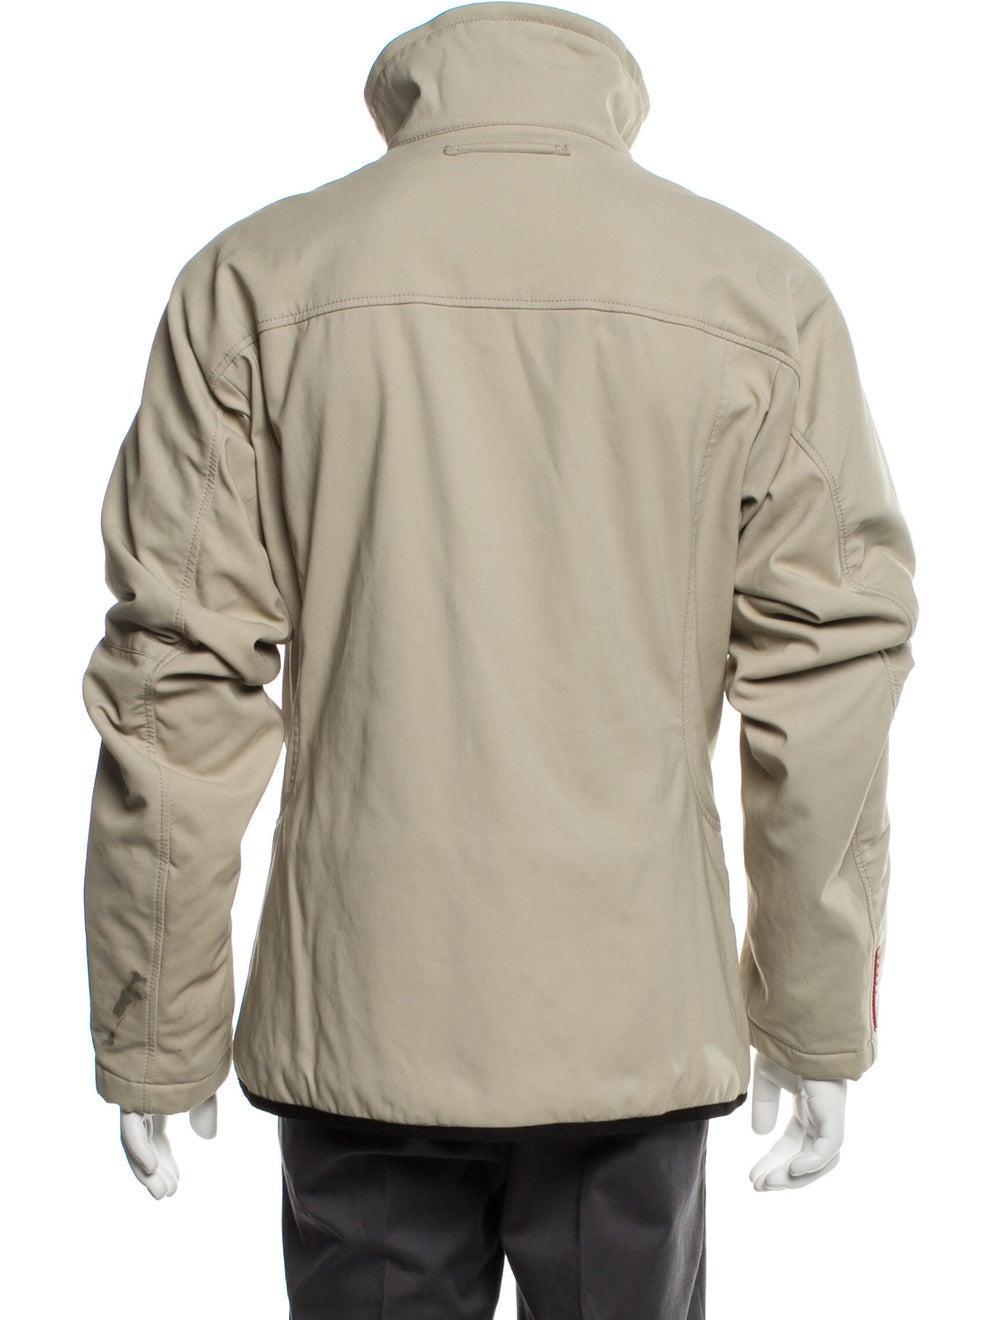 Prada Sport Jacket Brown - image 3